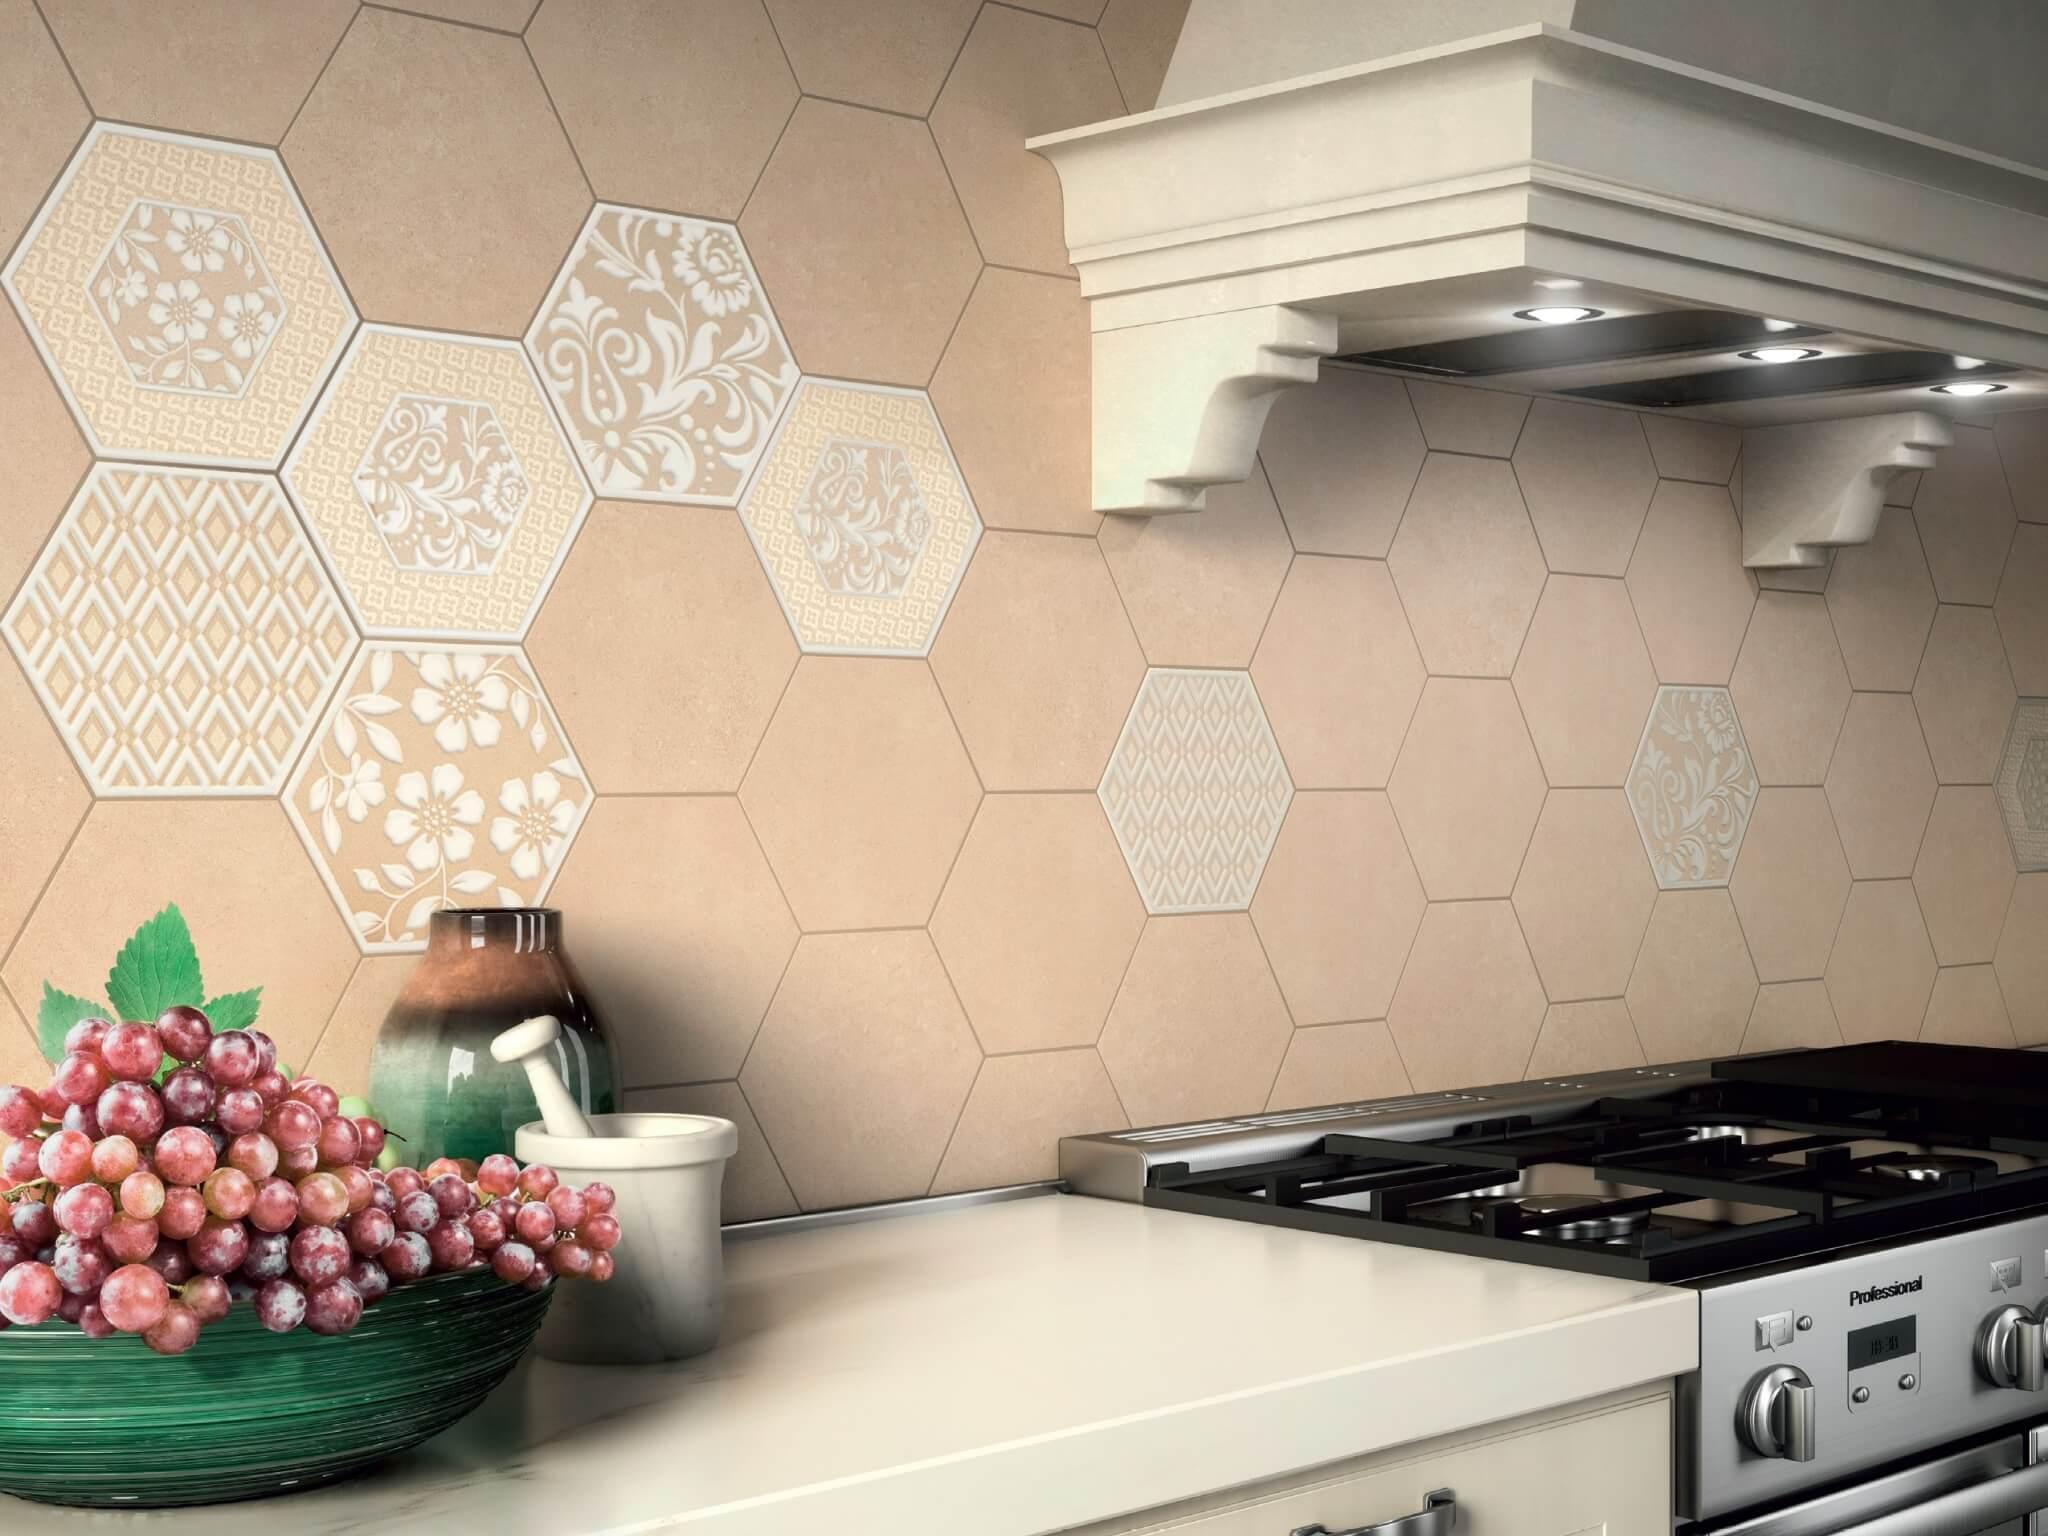 Kitchen Splashback Tile: Best Design and Decoration Ideas. Hexagonal Provence styled tiles